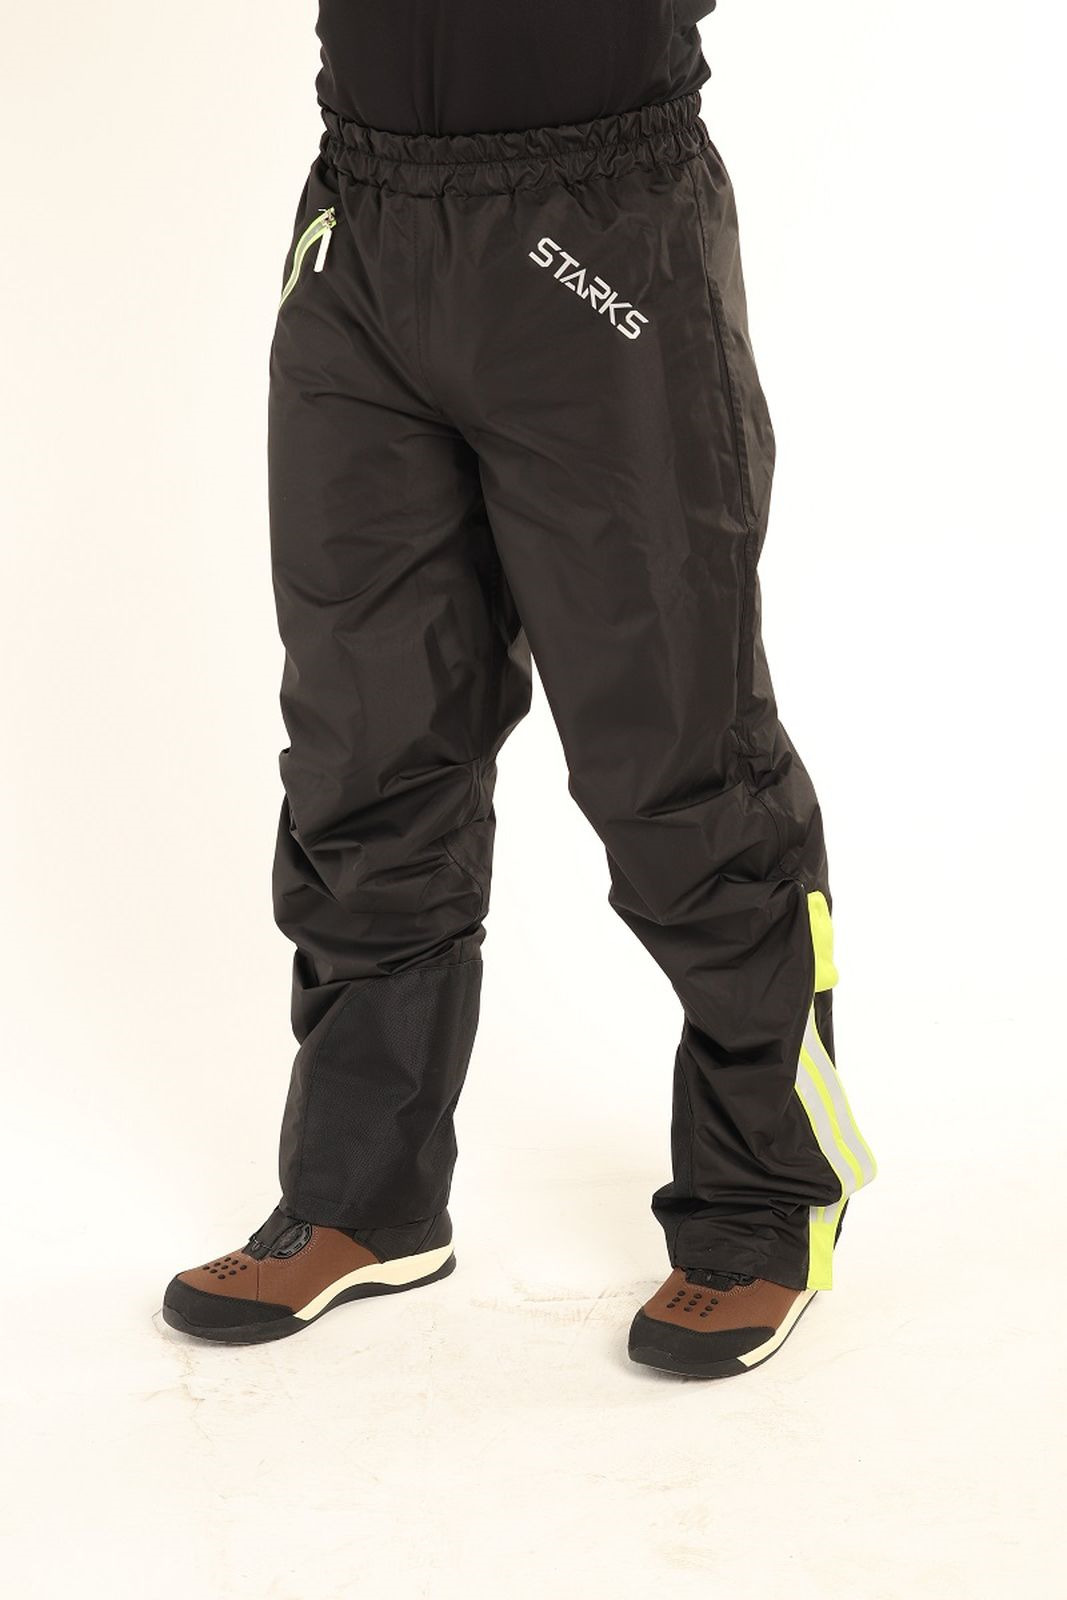 Мотодождевик мужской Starks Dry Rain, LC0084, черный, размер M